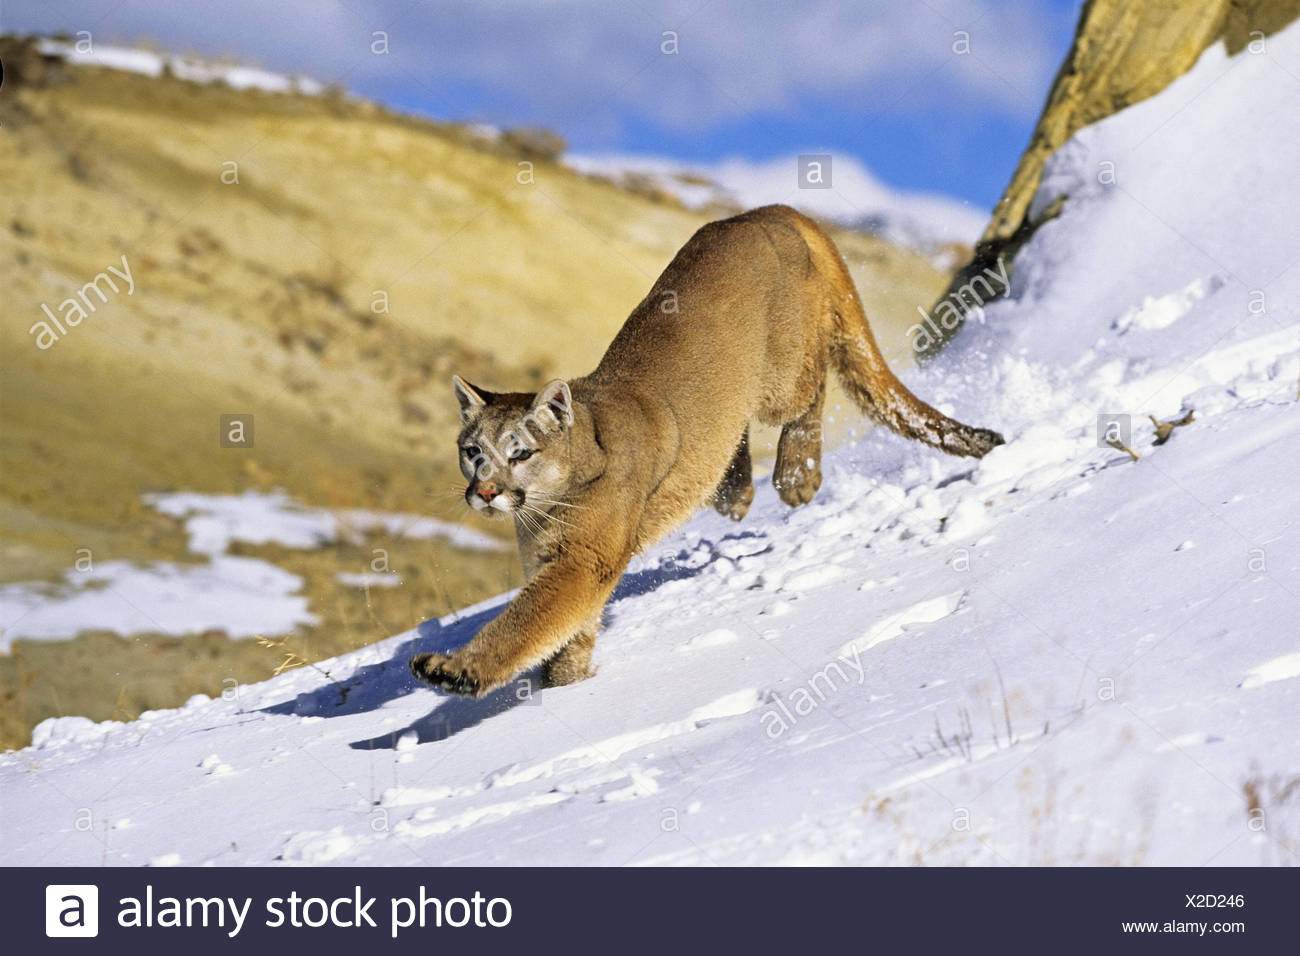 puma, mountain lion, cougar (Puma concolor, Profelis concolor), female cougar in snow walking, USA, Colorado - Stock Image